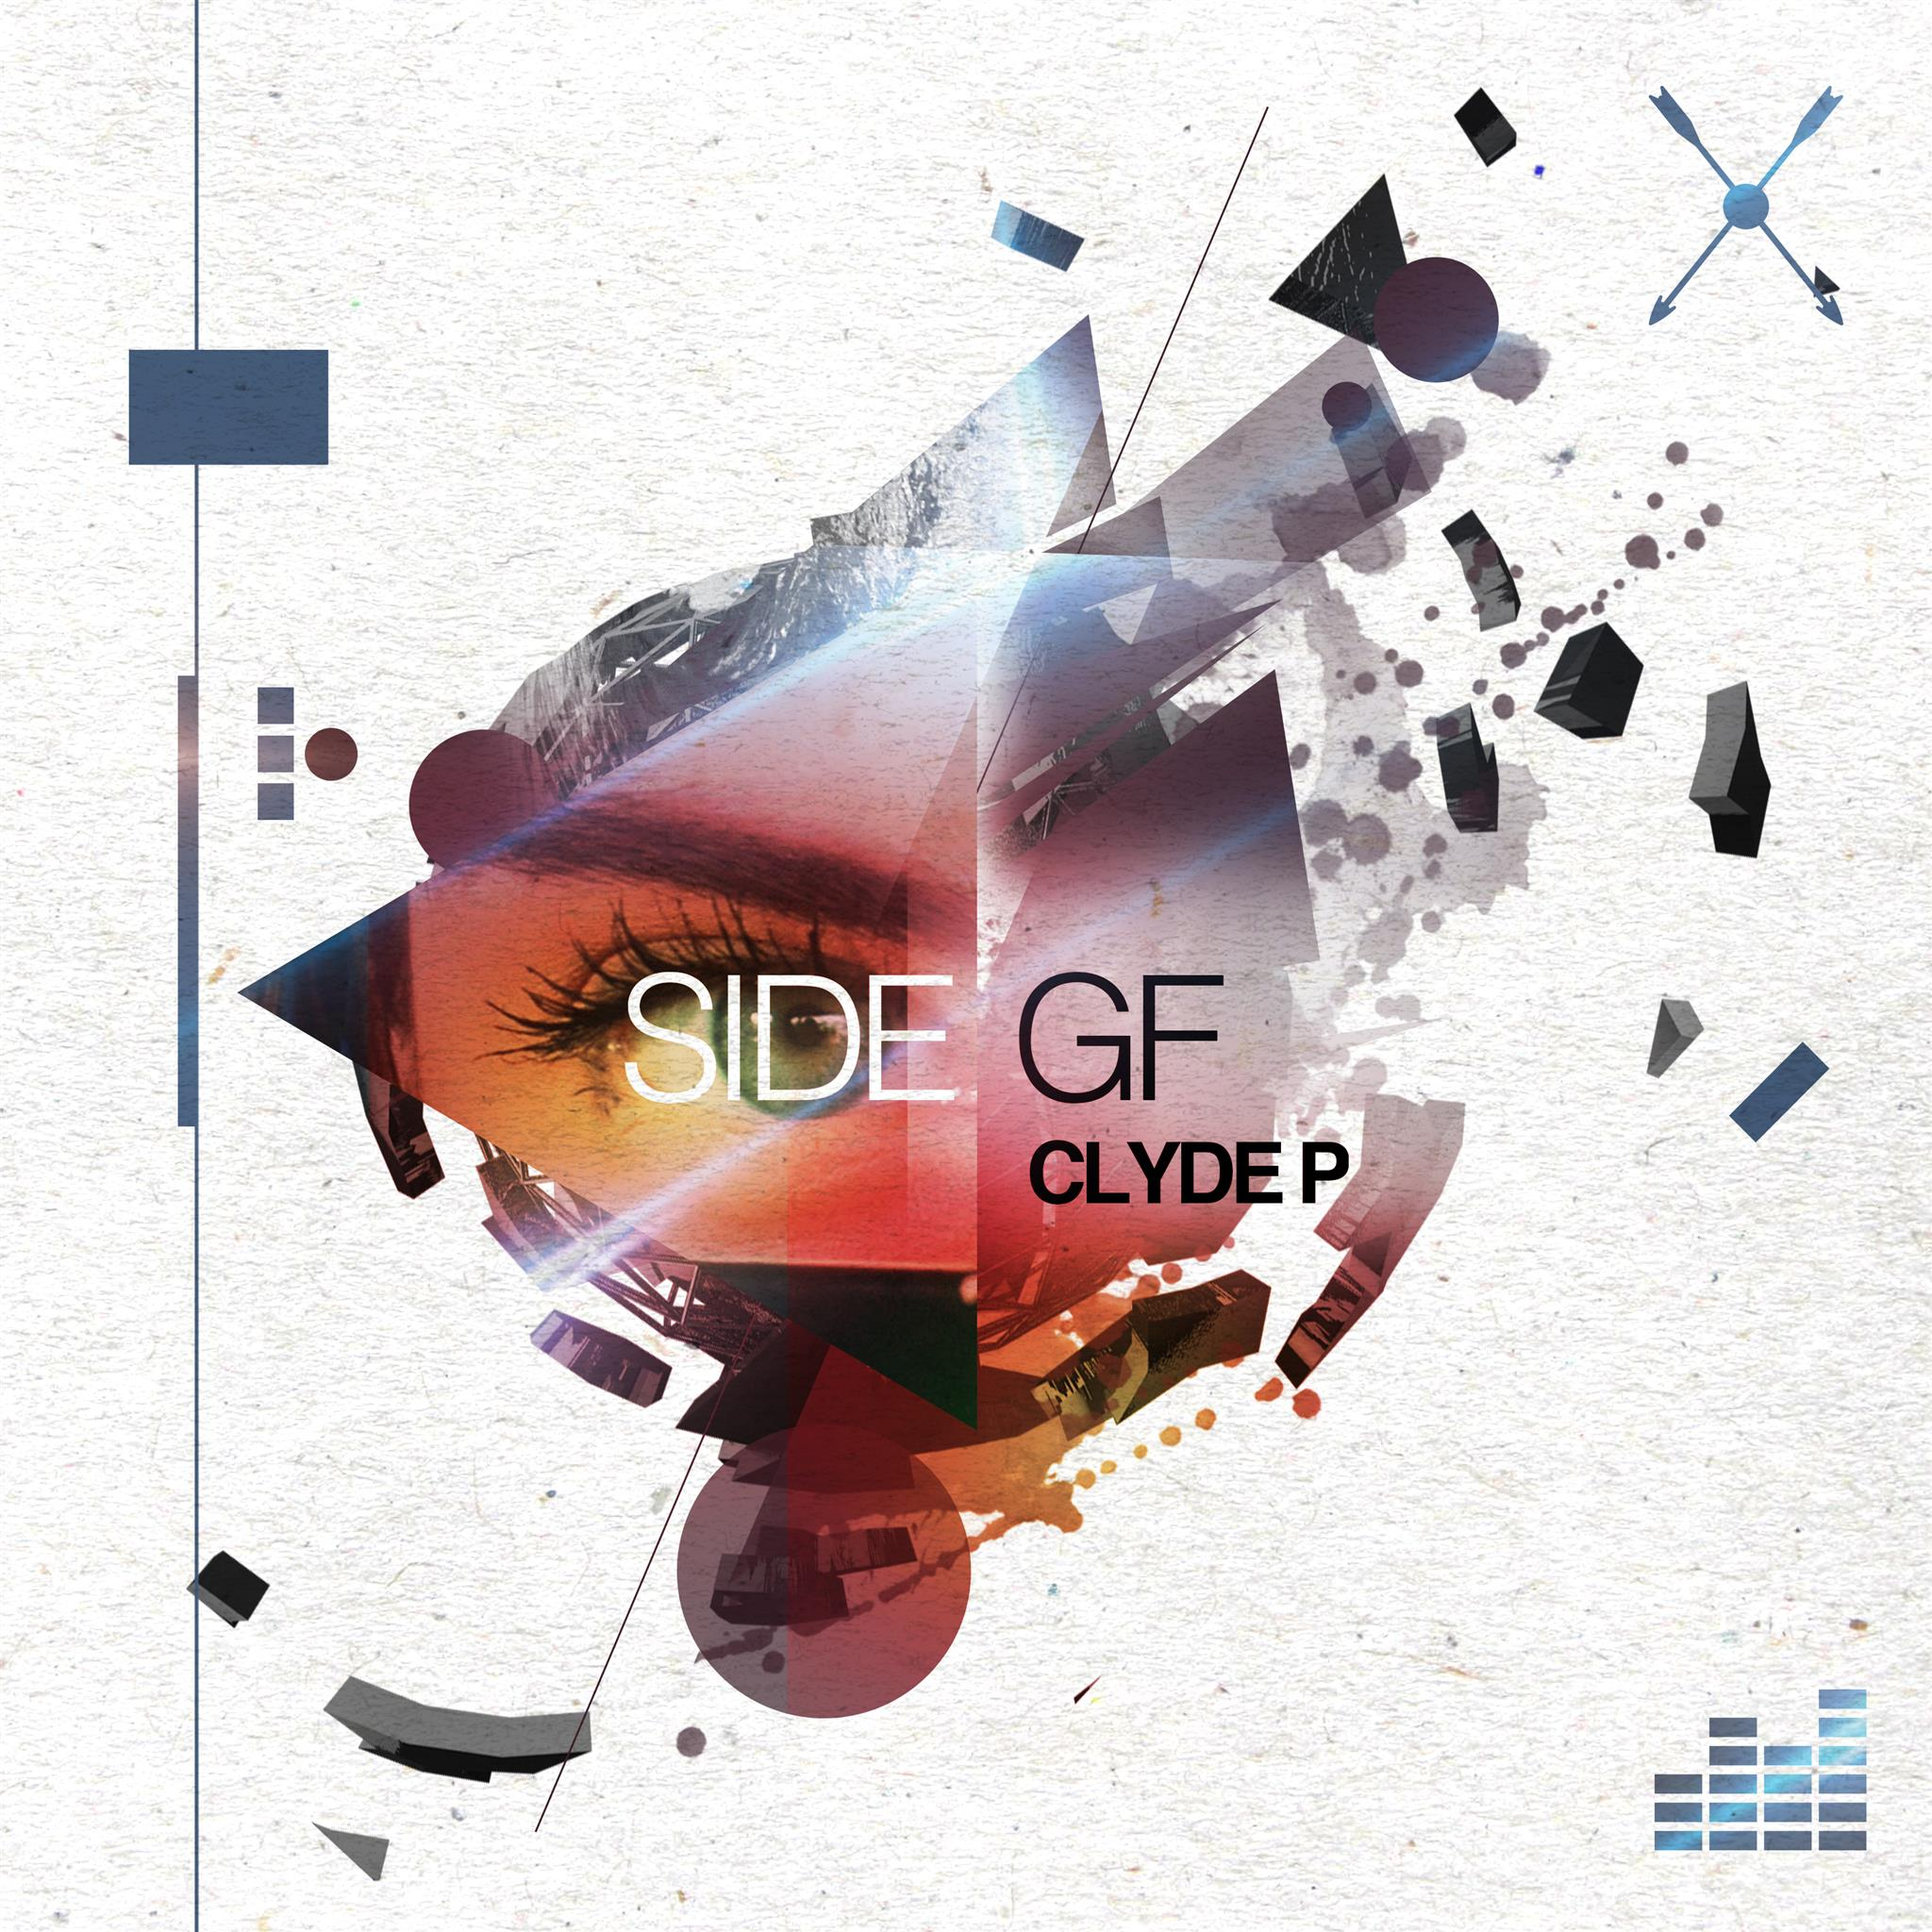 clyde_p_side_gf_artwork.jpg